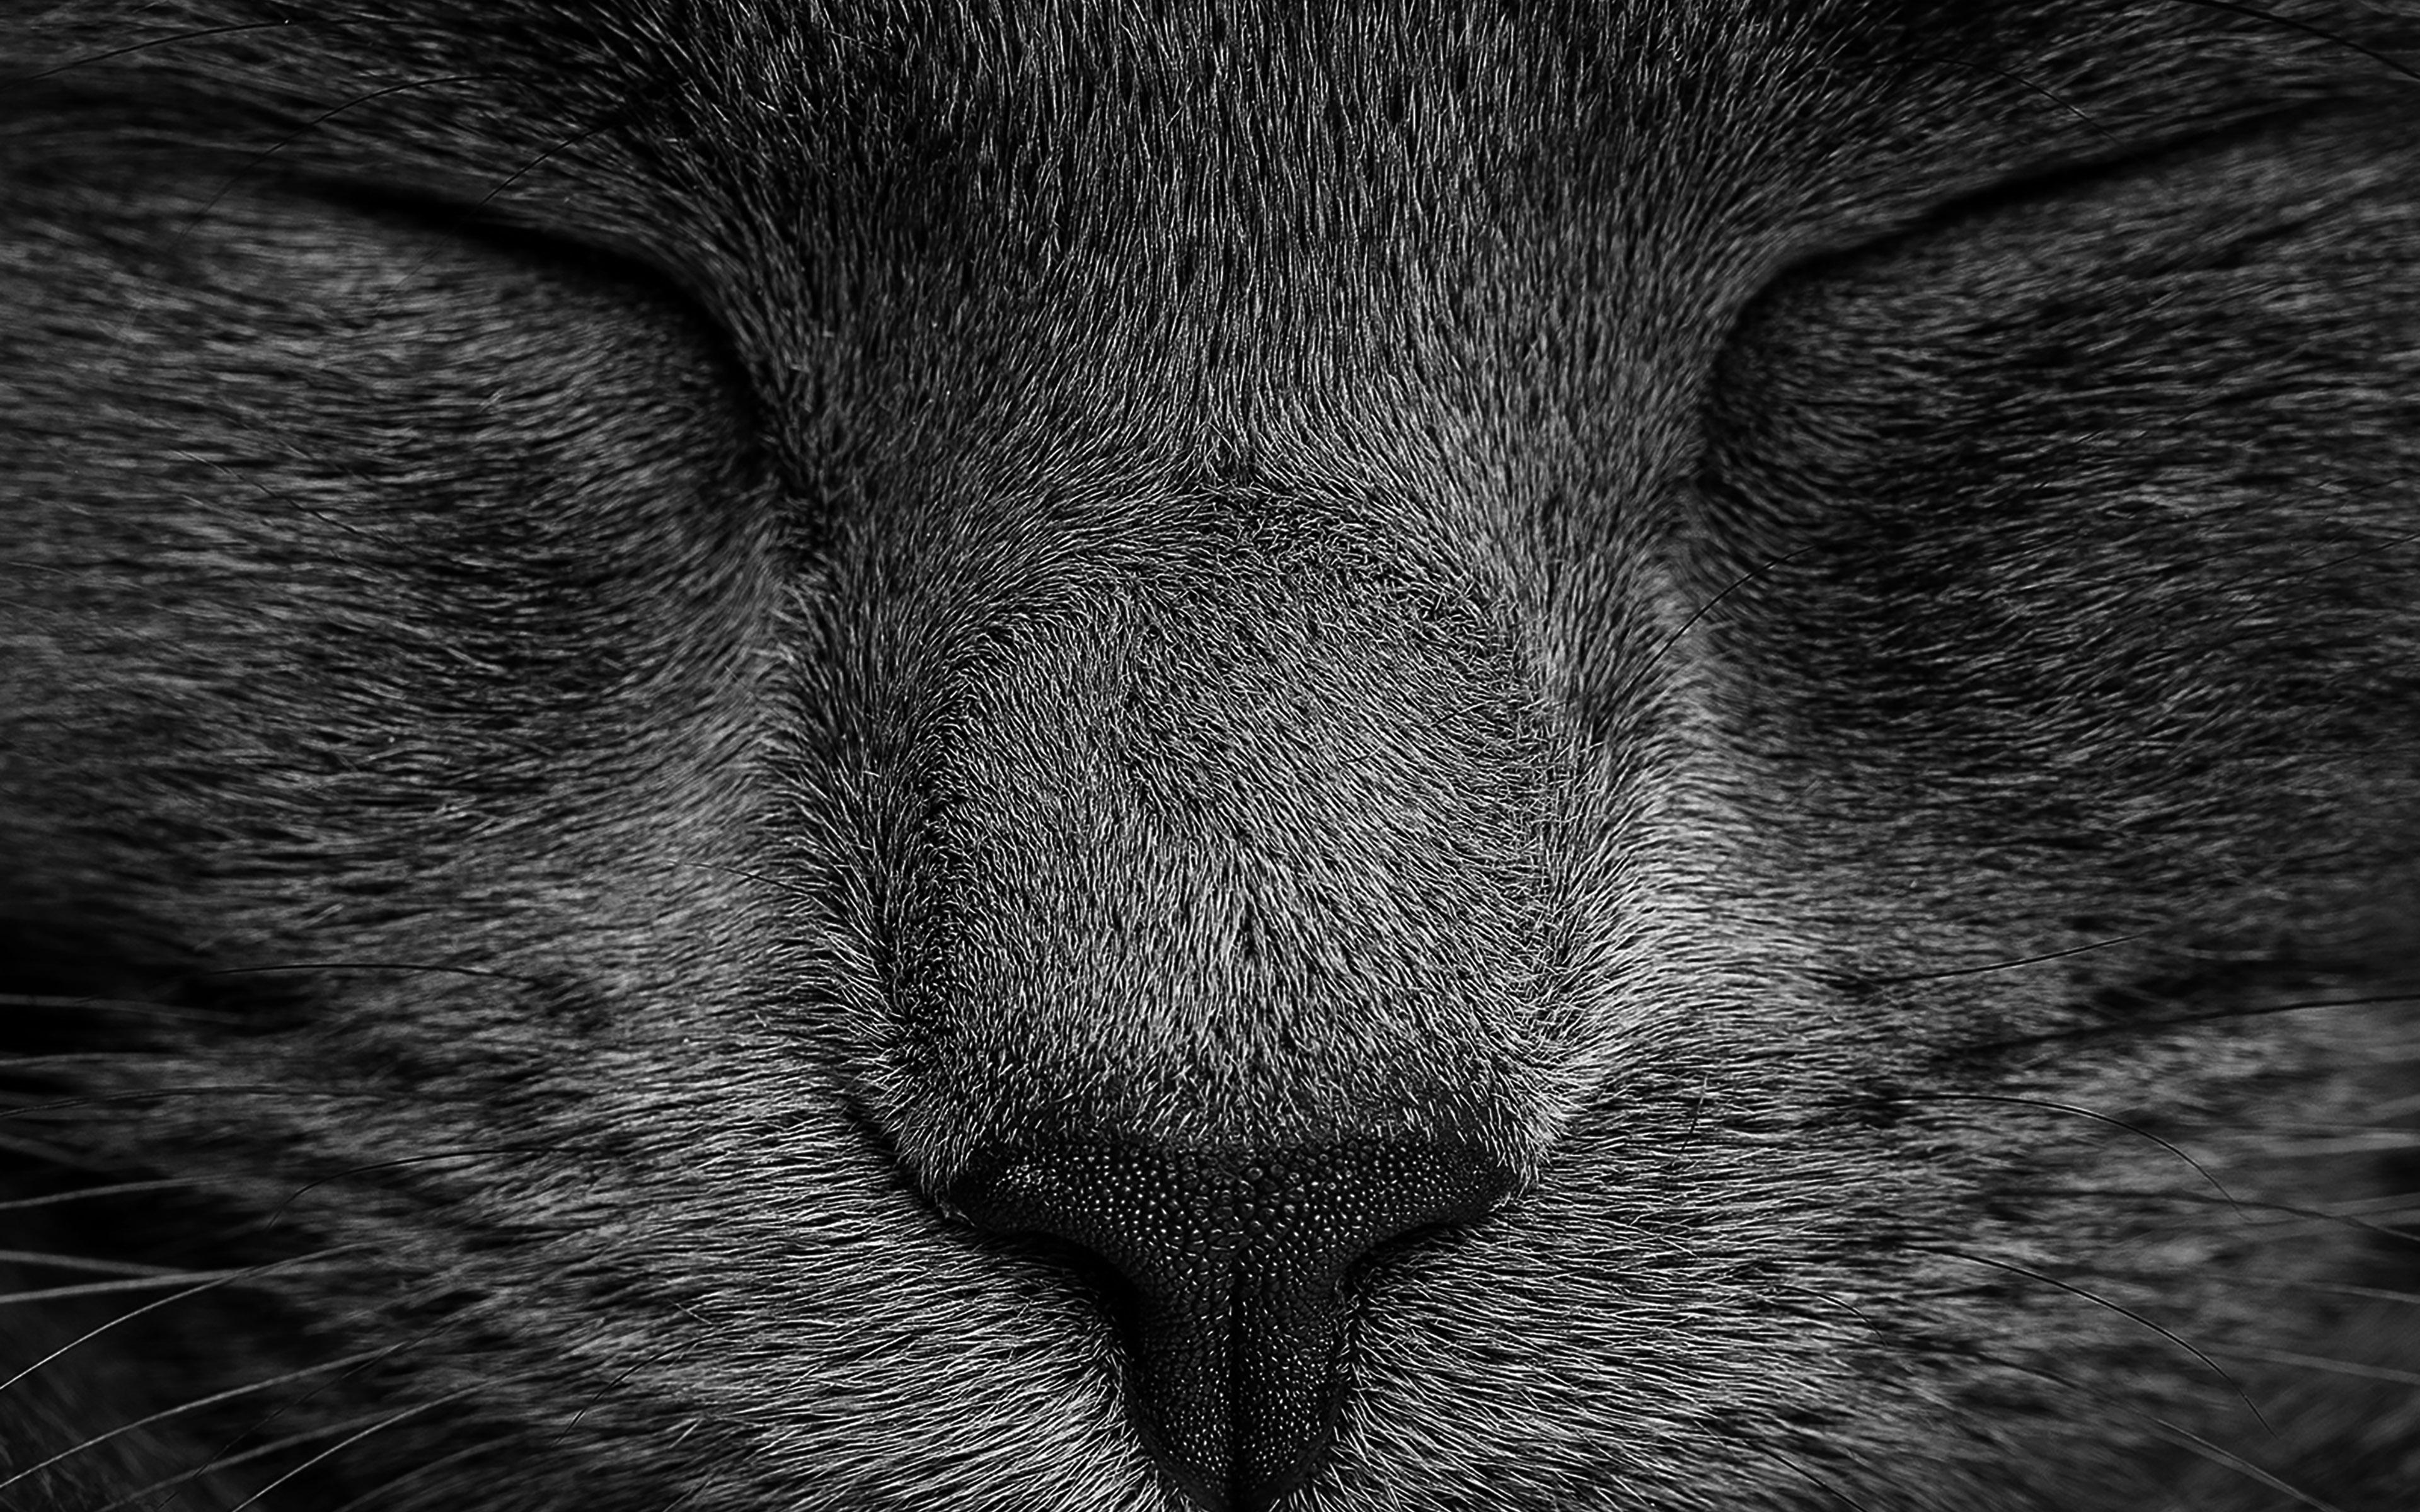 Cute Black Cat Iphone Wallpaper Ae80 Sleeping Black Cat Zoom Nature Wallpaper